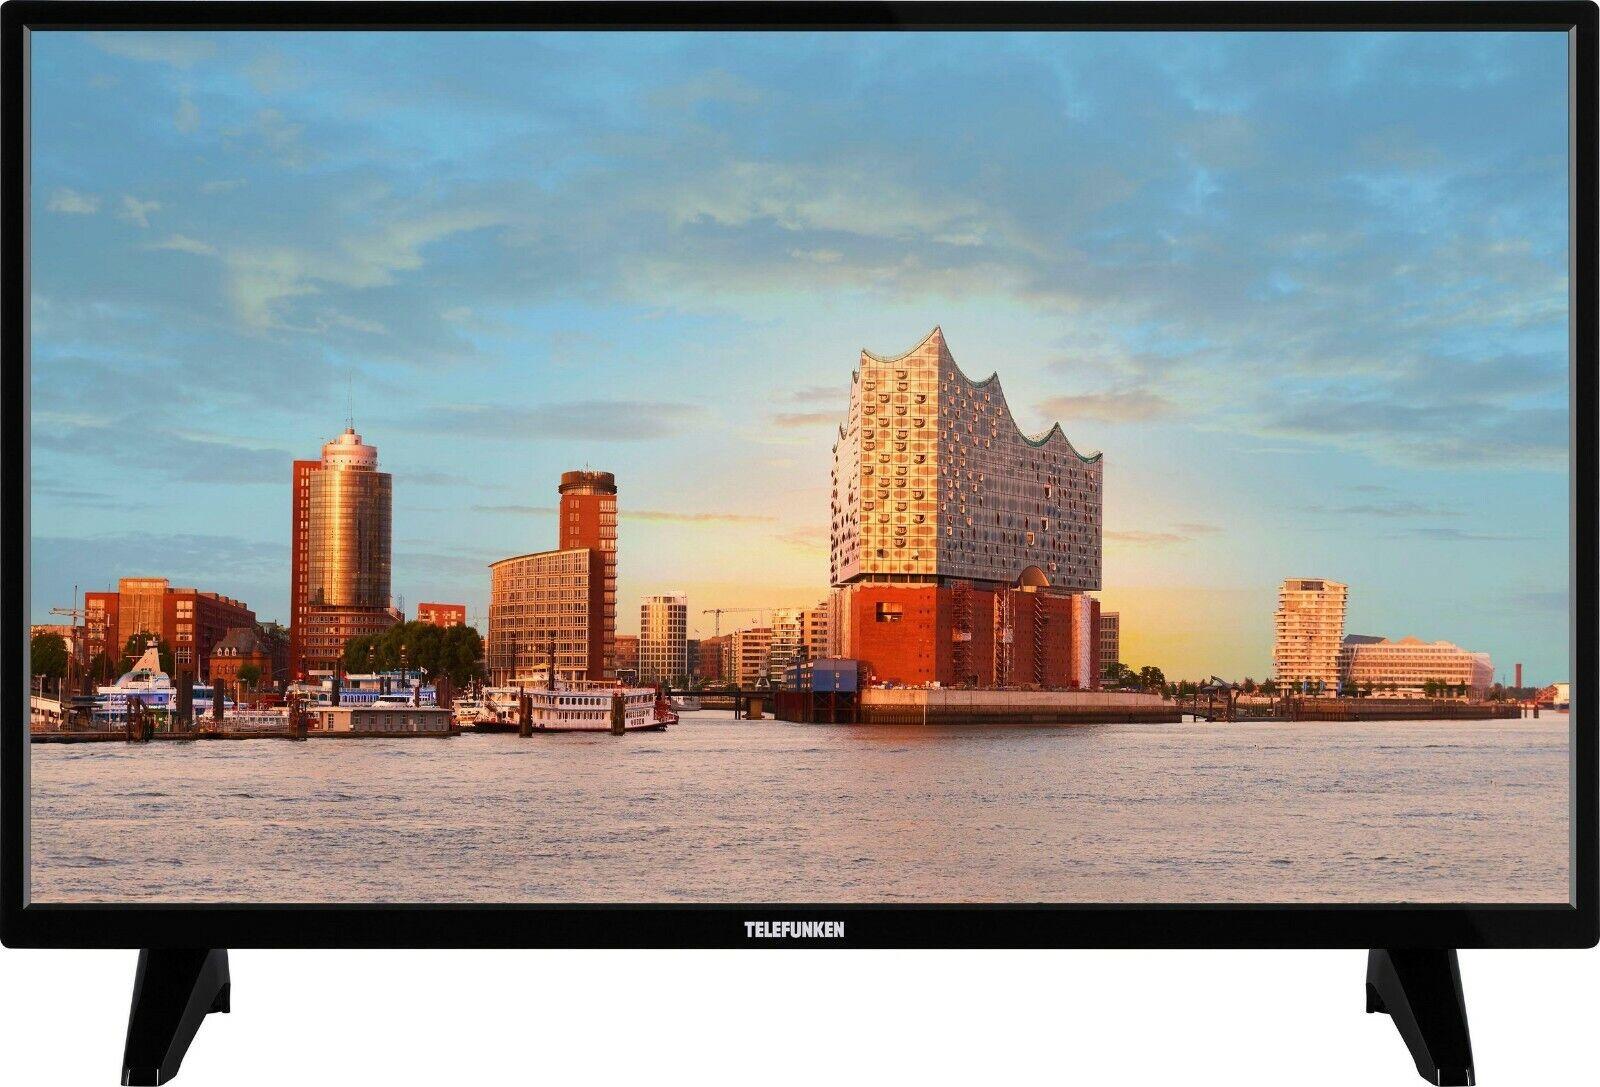 Telefunken LED-Fernseher 81 cm/32 Zoll, HD,Triple Tuner (DVB-T2/C/S2) HDMI USB